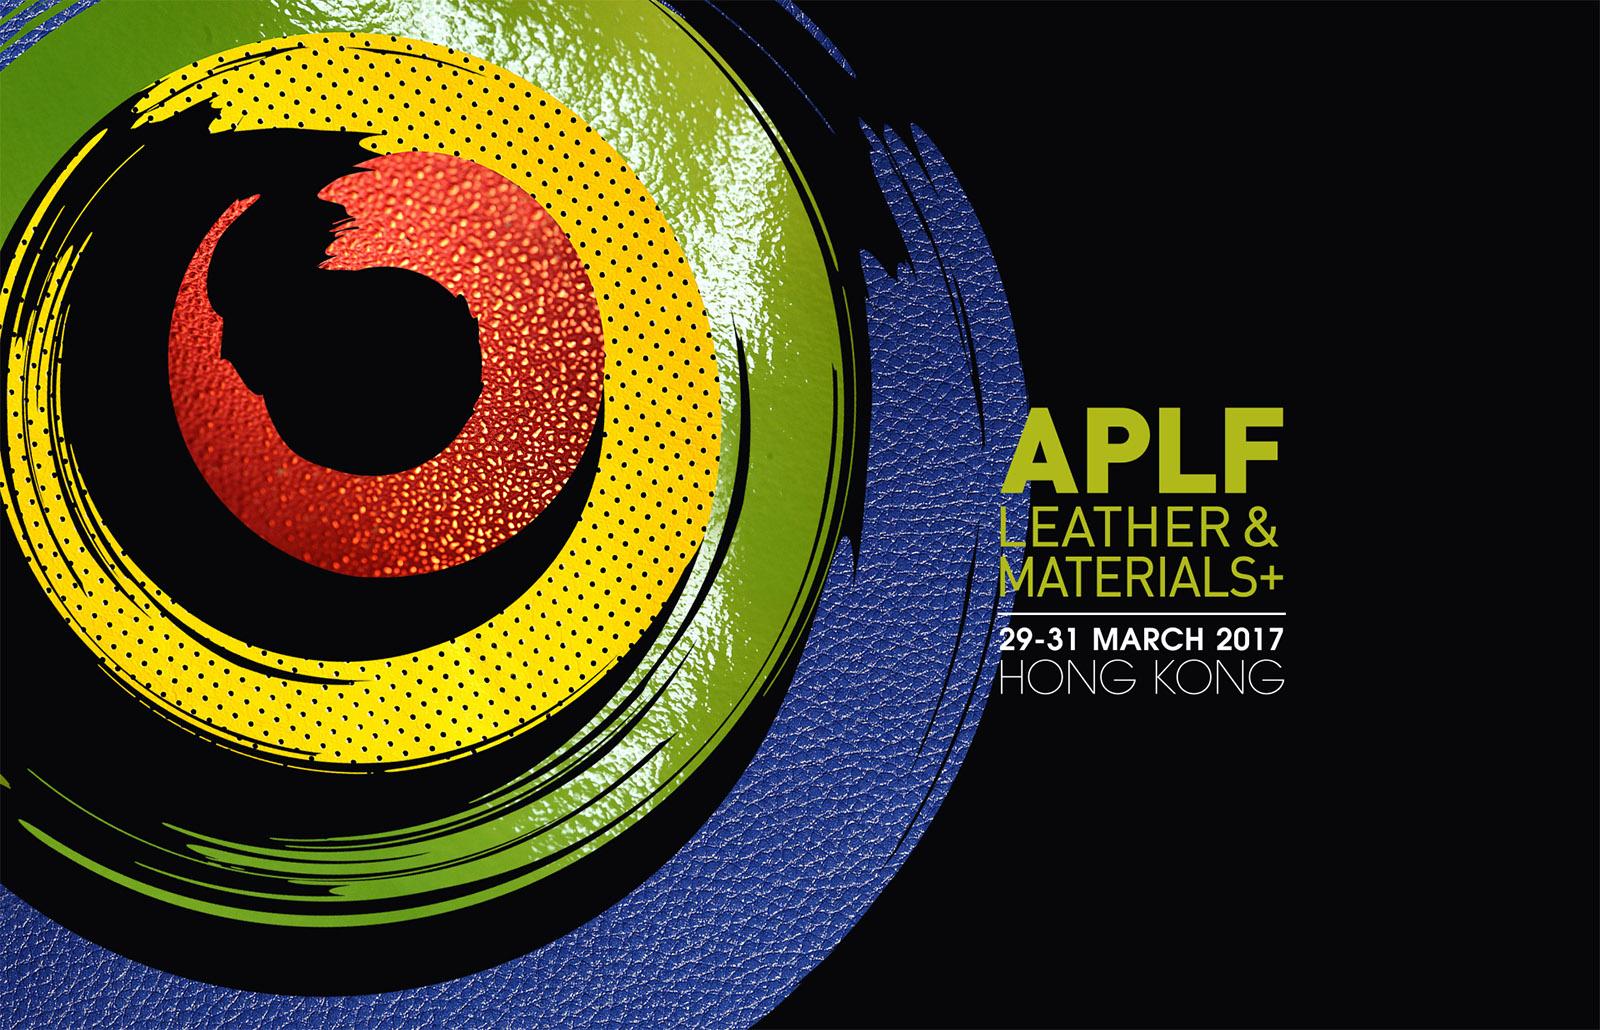 APLF LEATHER&MATERIALS+ 2017 HONG KONG